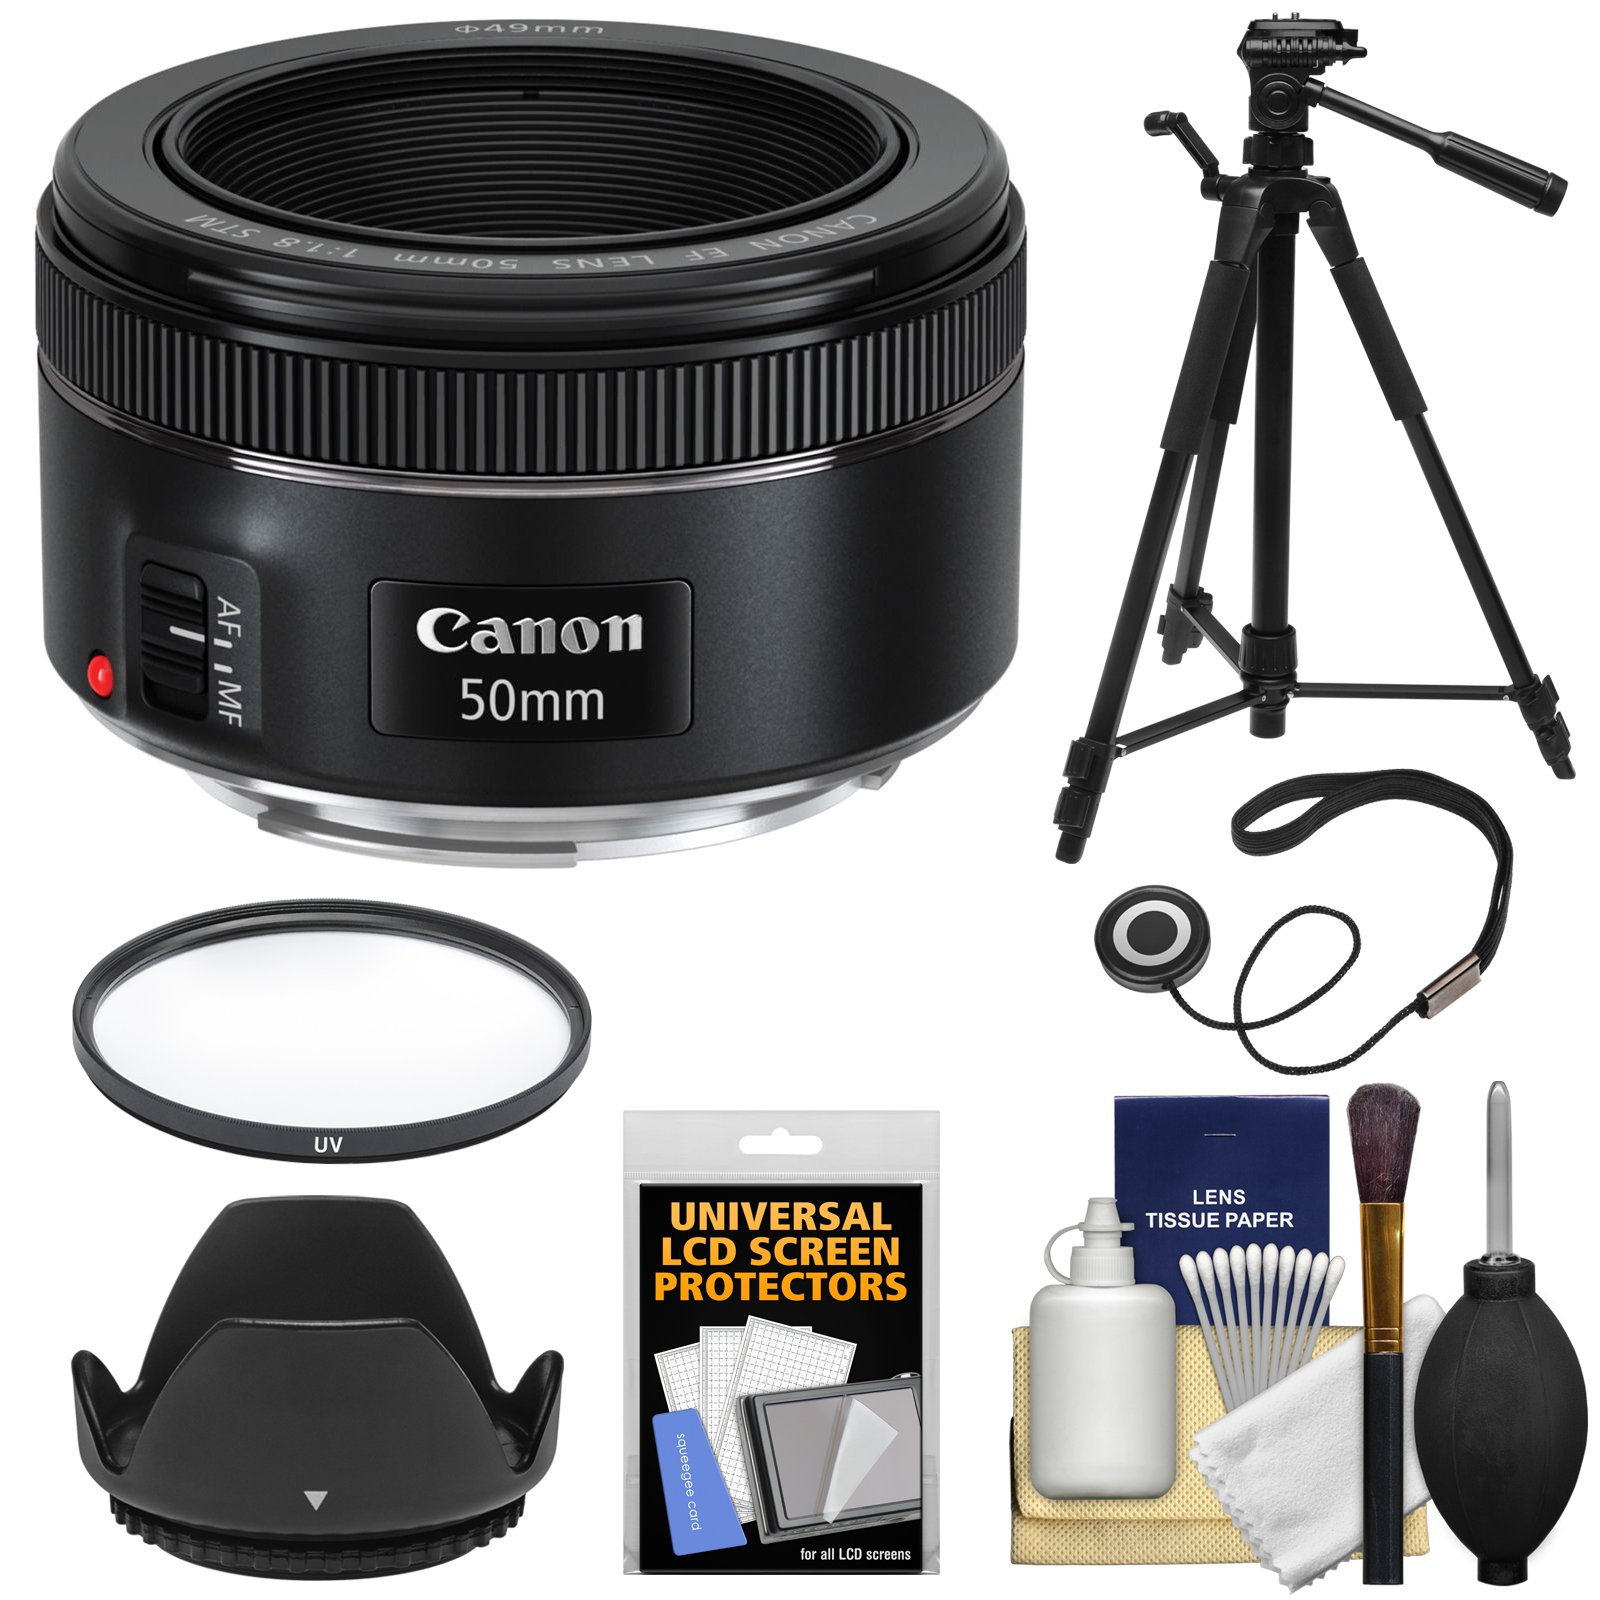 Canon EF 50mm f/1.8 STM Lens + Filter + Lens Hood + Tripod Kit for EOS 6D, 70D, 7D, 5DS, 5D Mark II III, Rebel T3, T3i, T5, T5i, T6i, T6s, SL1 Camera